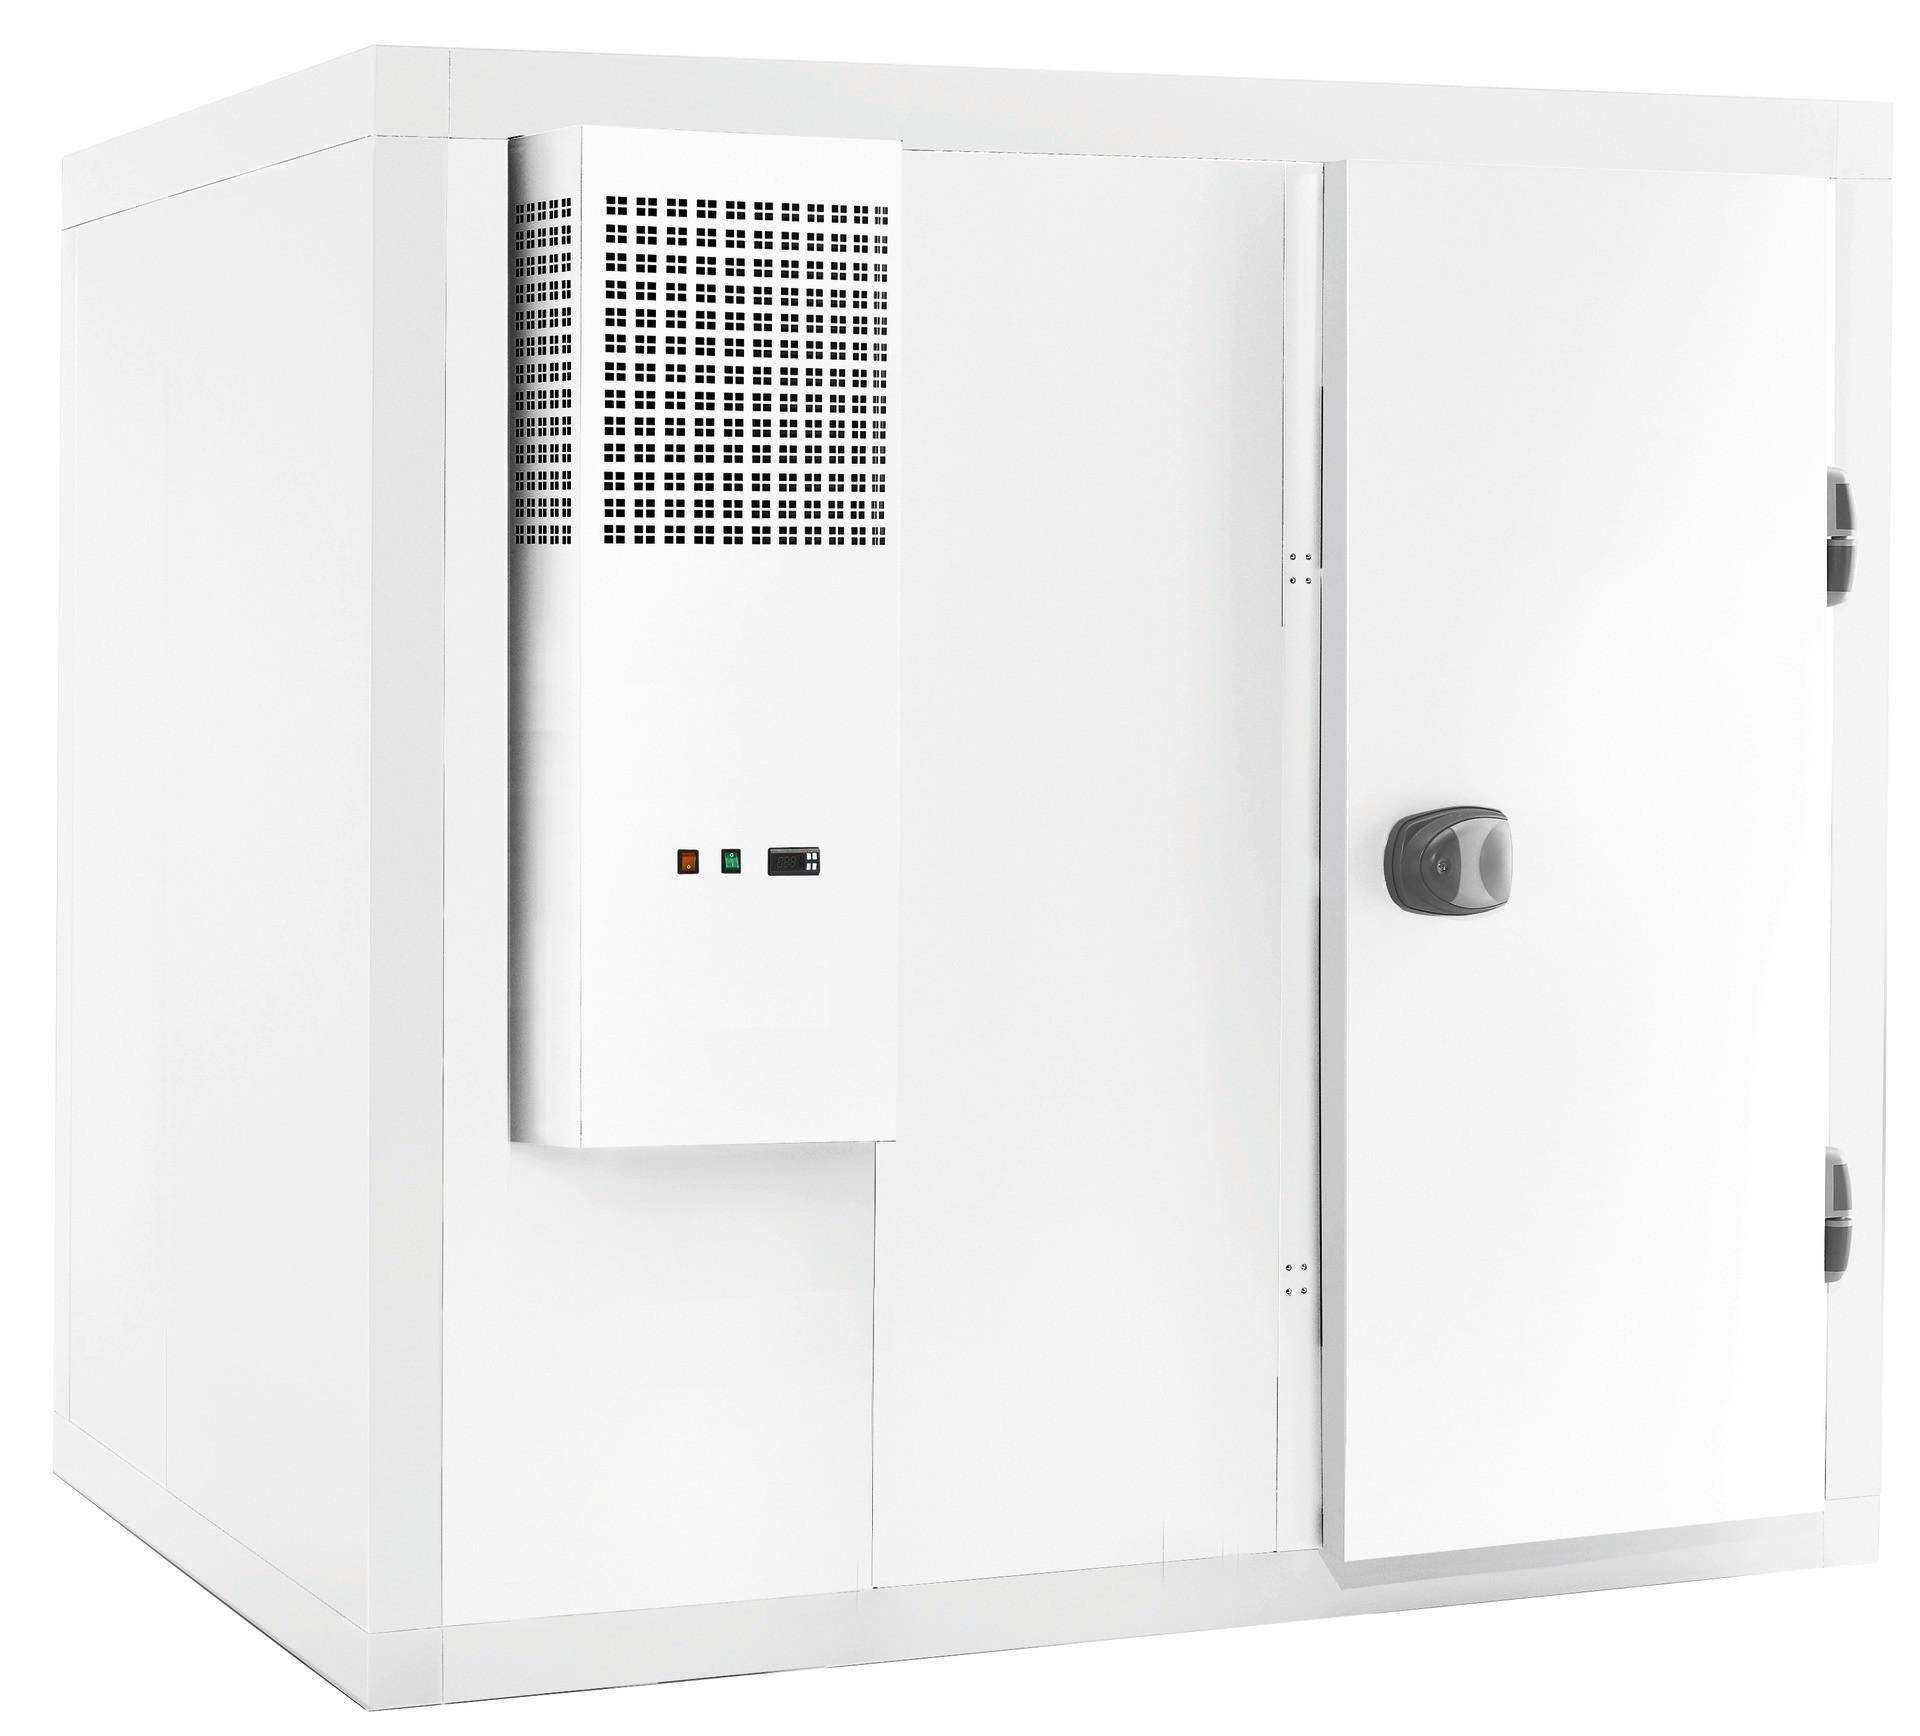 Tiefkühlaggregat für Kühlzelle 661034, 661035, 661038